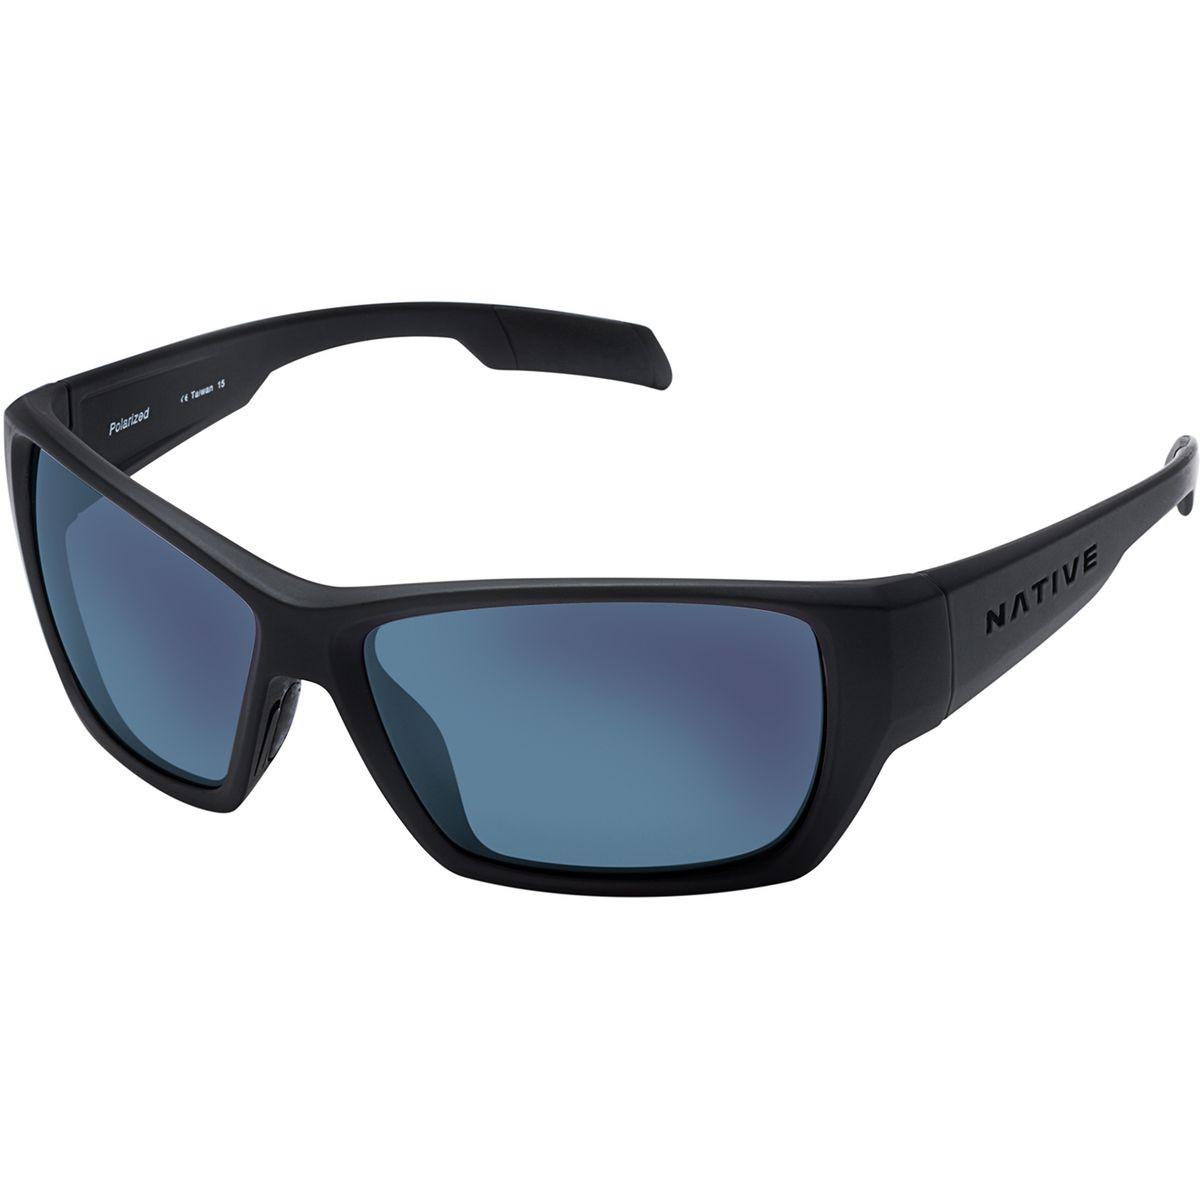 35e4c3b51f Vsp Oakley Glasses « Heritage Malta